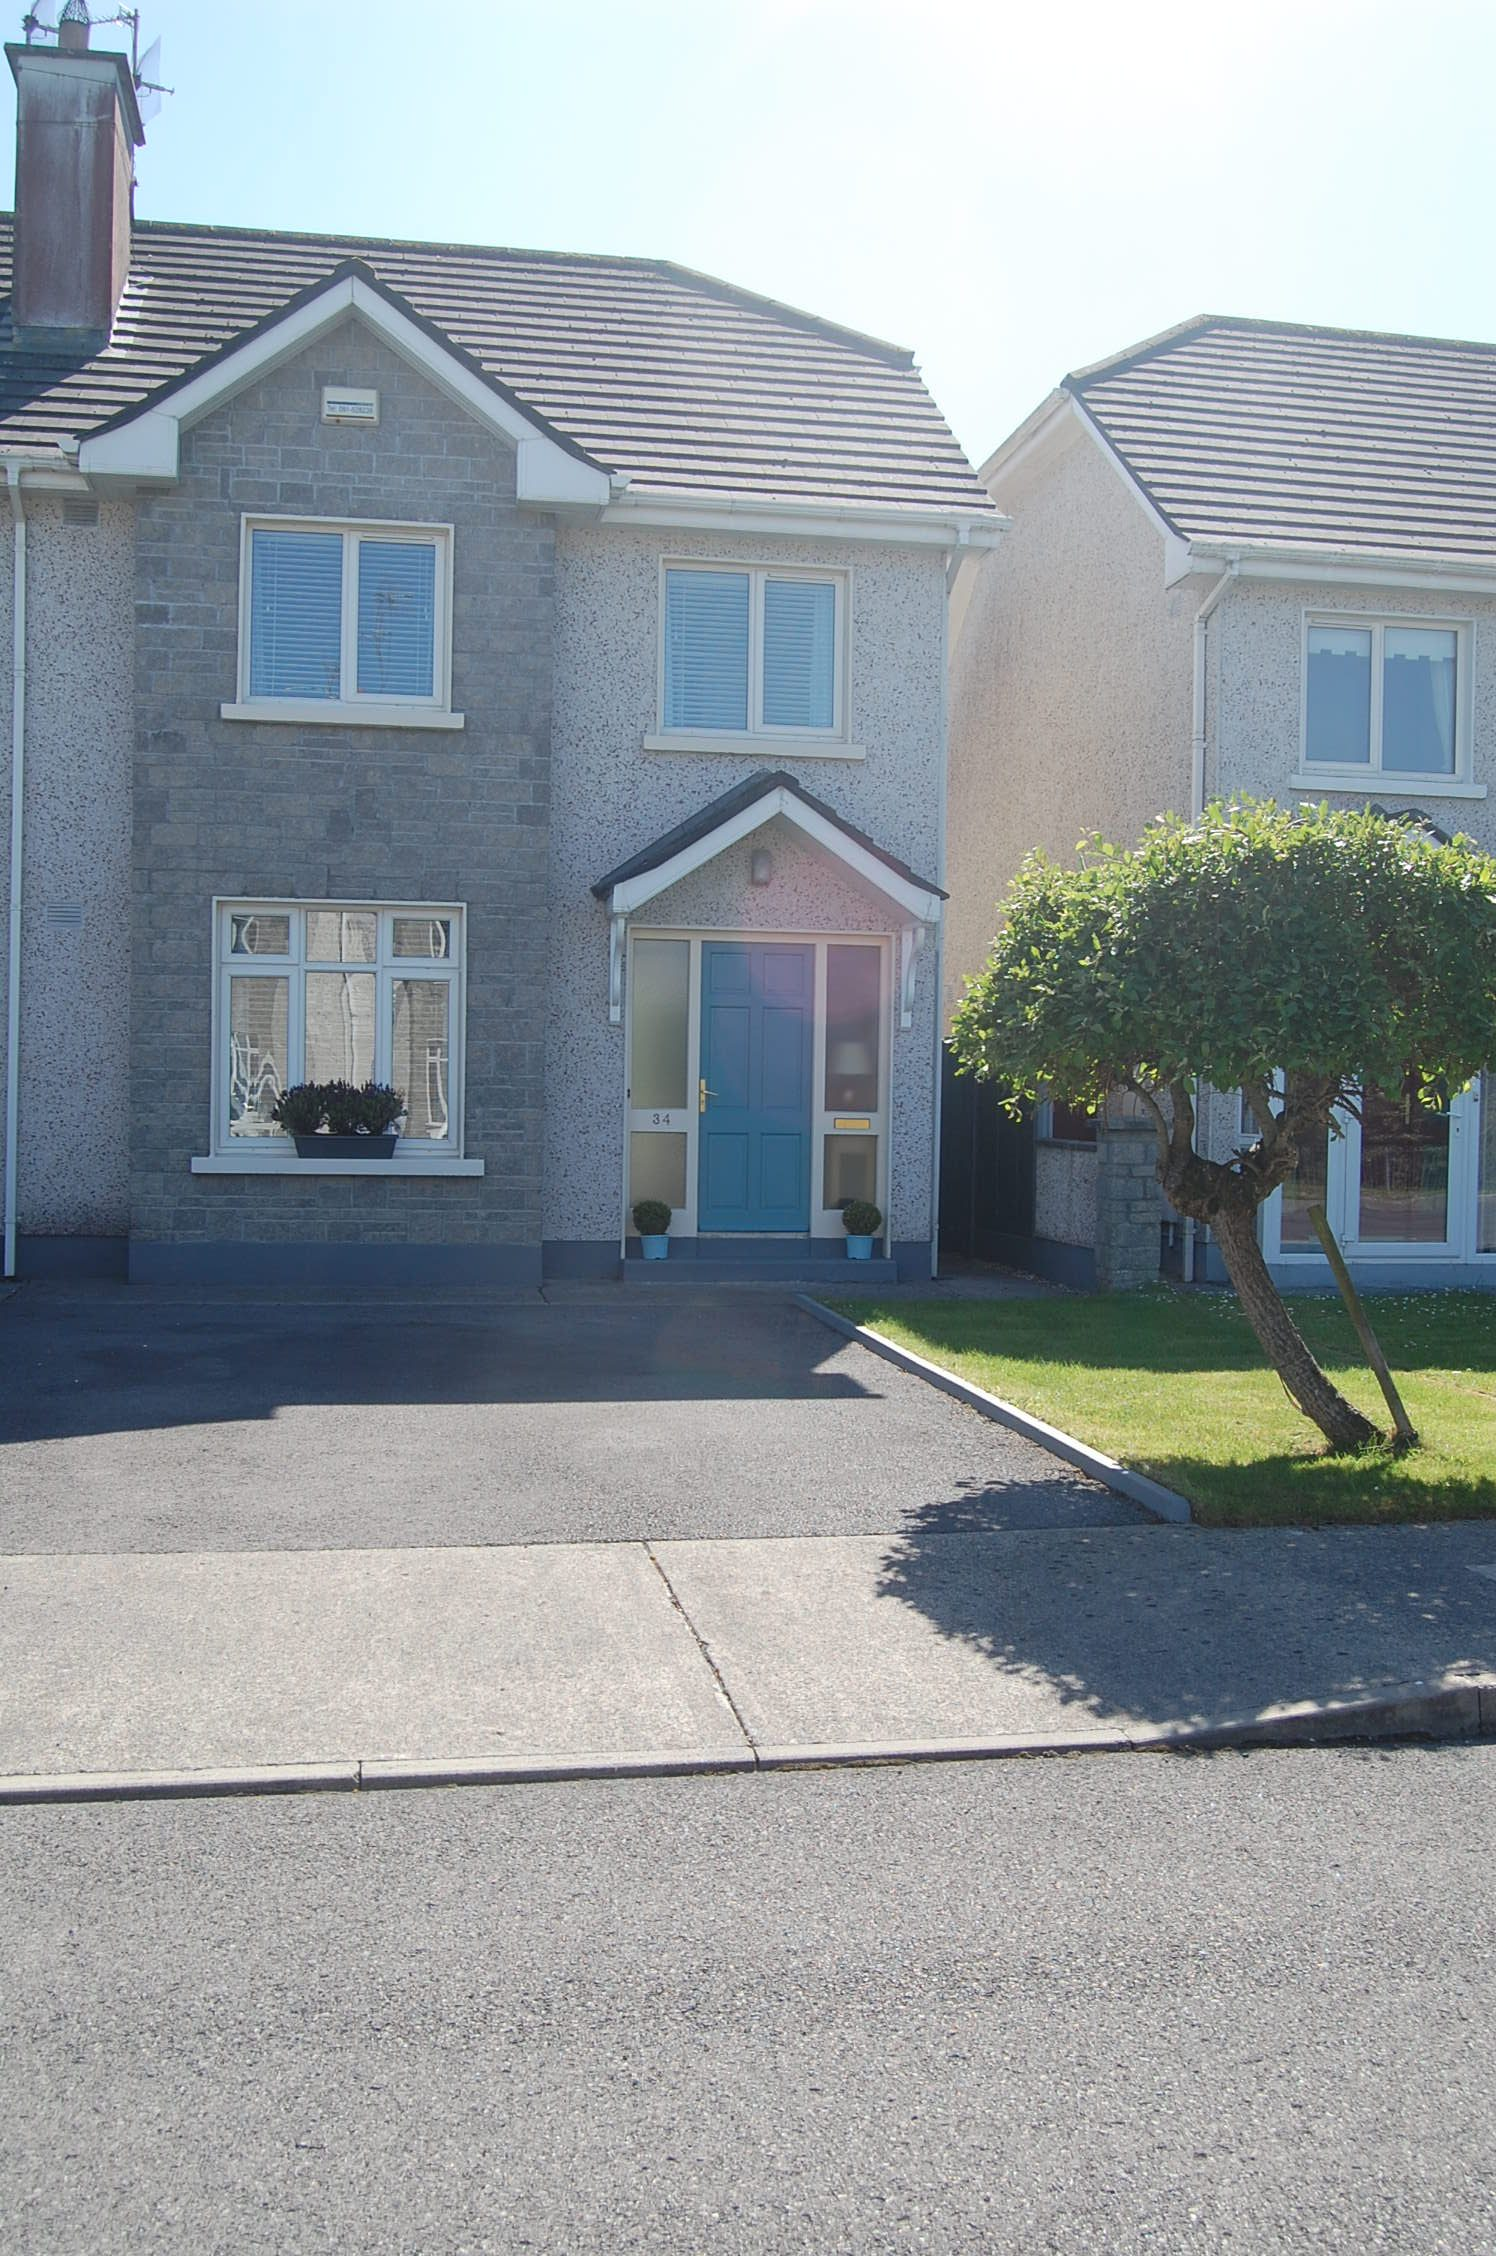 34 Clochóg, Oranmore, Oranmore, Co. Galway Eircode: H91 Y9X3